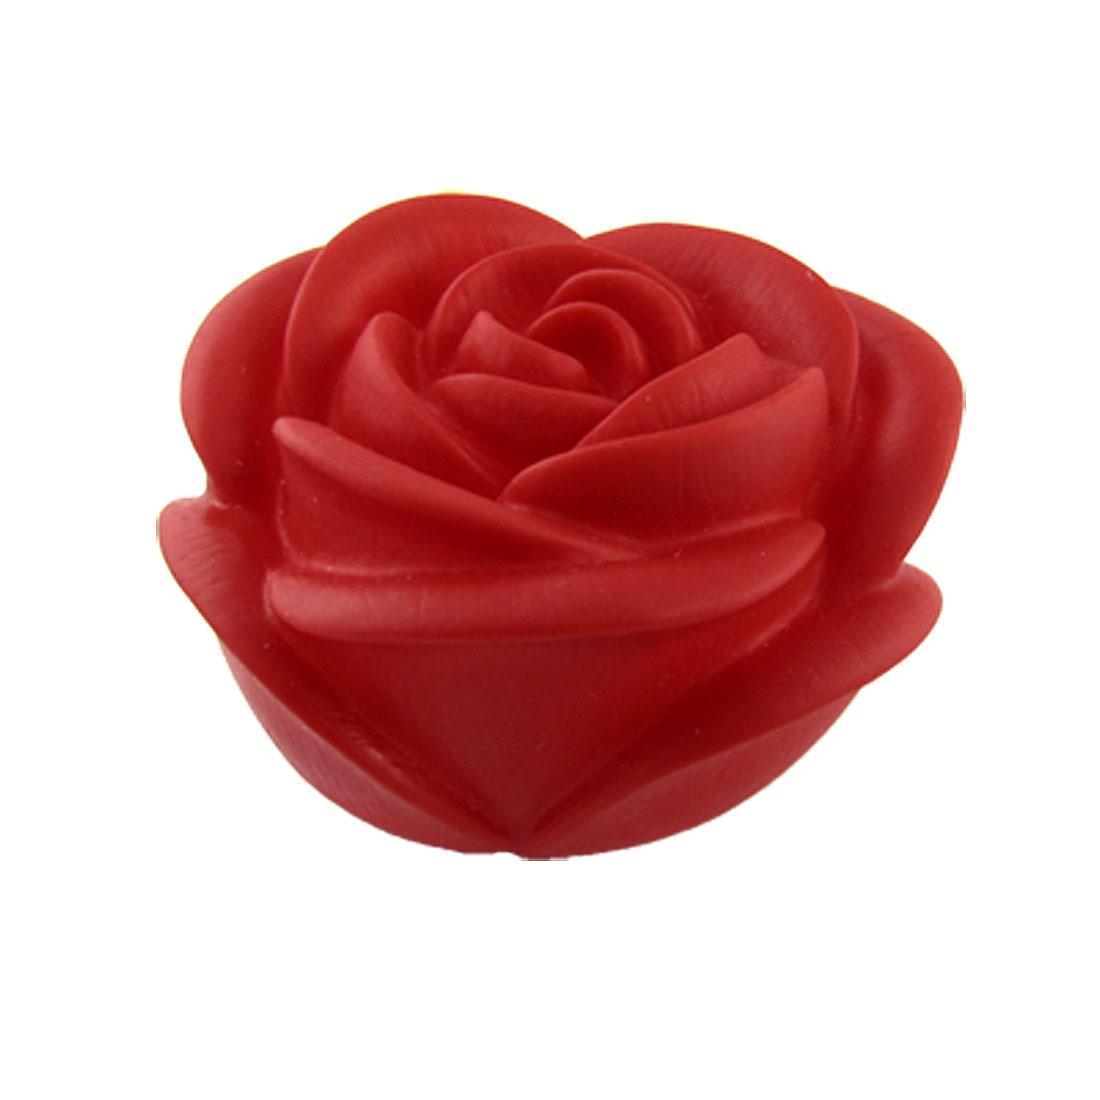 Home Romantic Red Rose Desk Lamps Bedroom Night Light